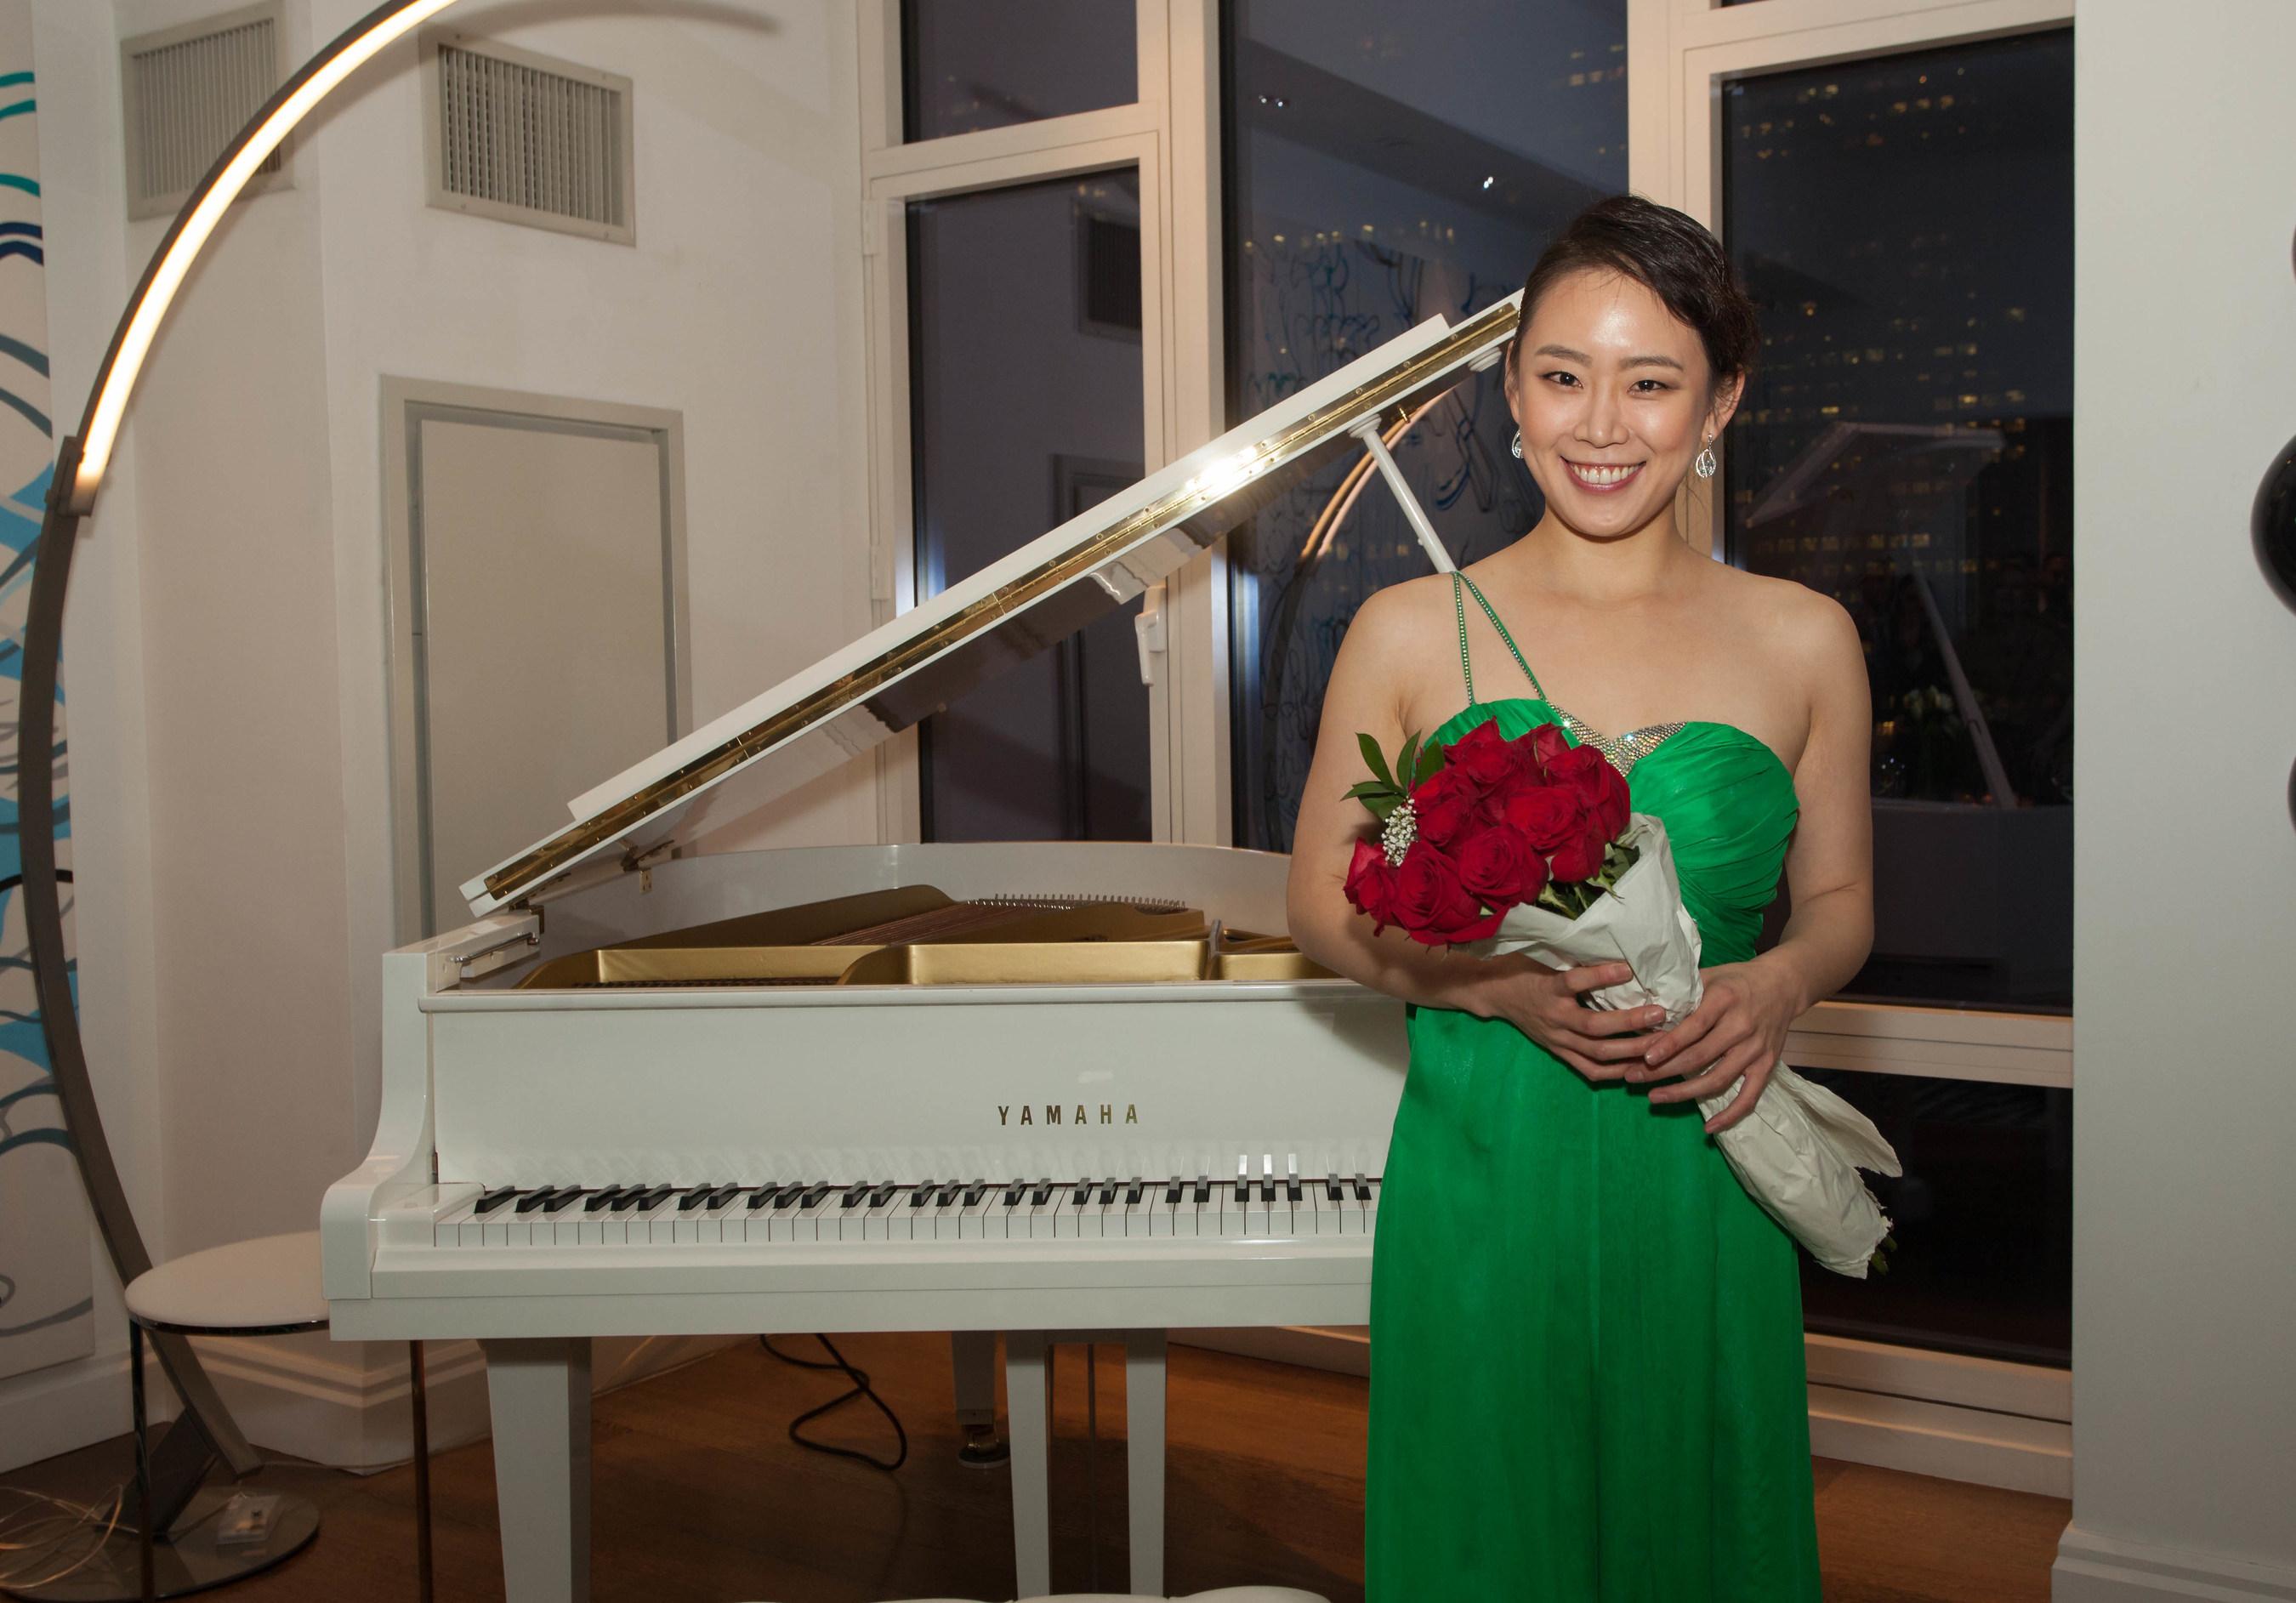 Yoonie Han Concert Pianist Closing Ceremony